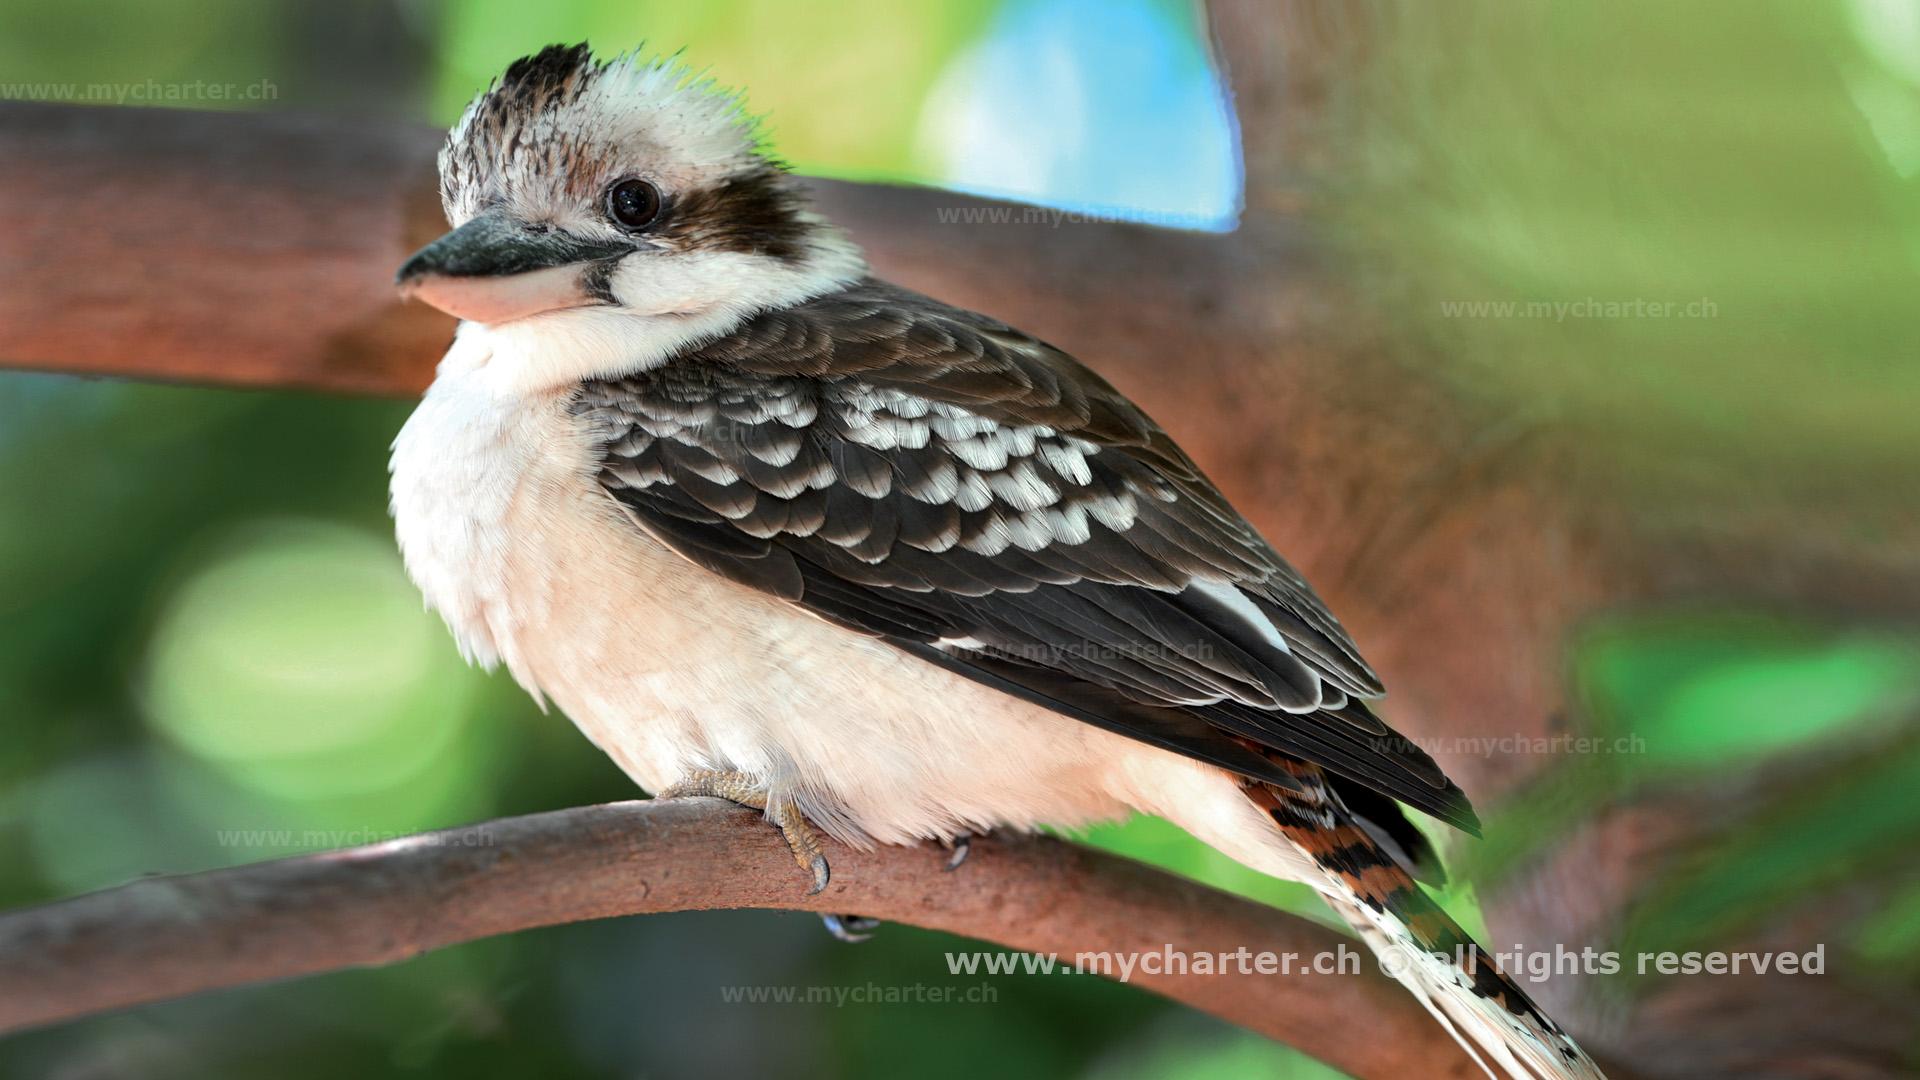 Yachtcharter Australien - Laughing Kookaburra Bird